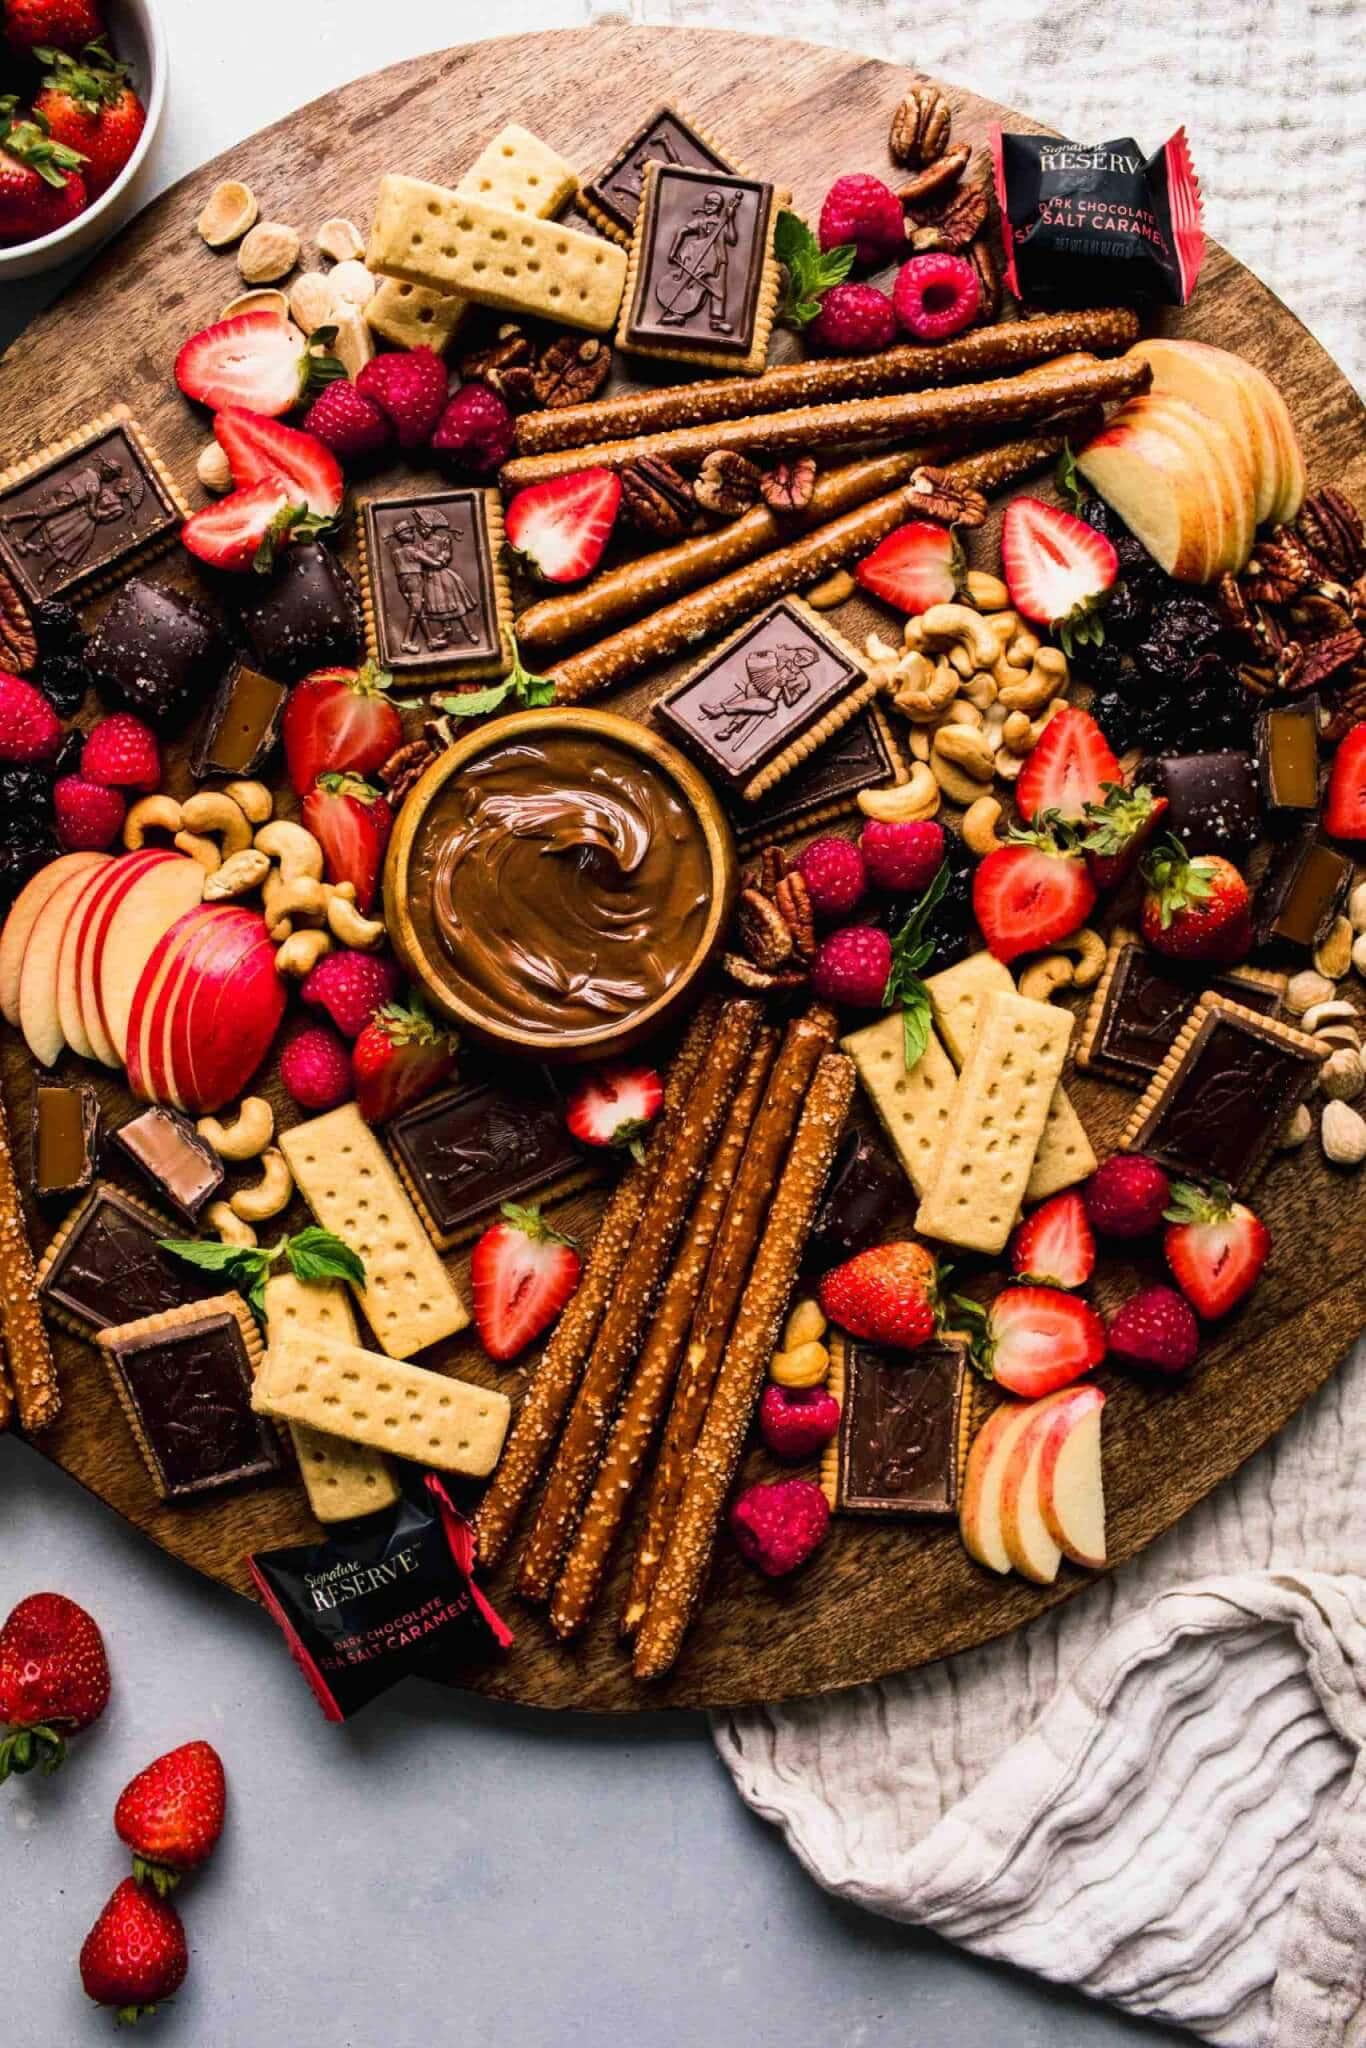 Arranged Dessert Chocolate Board.